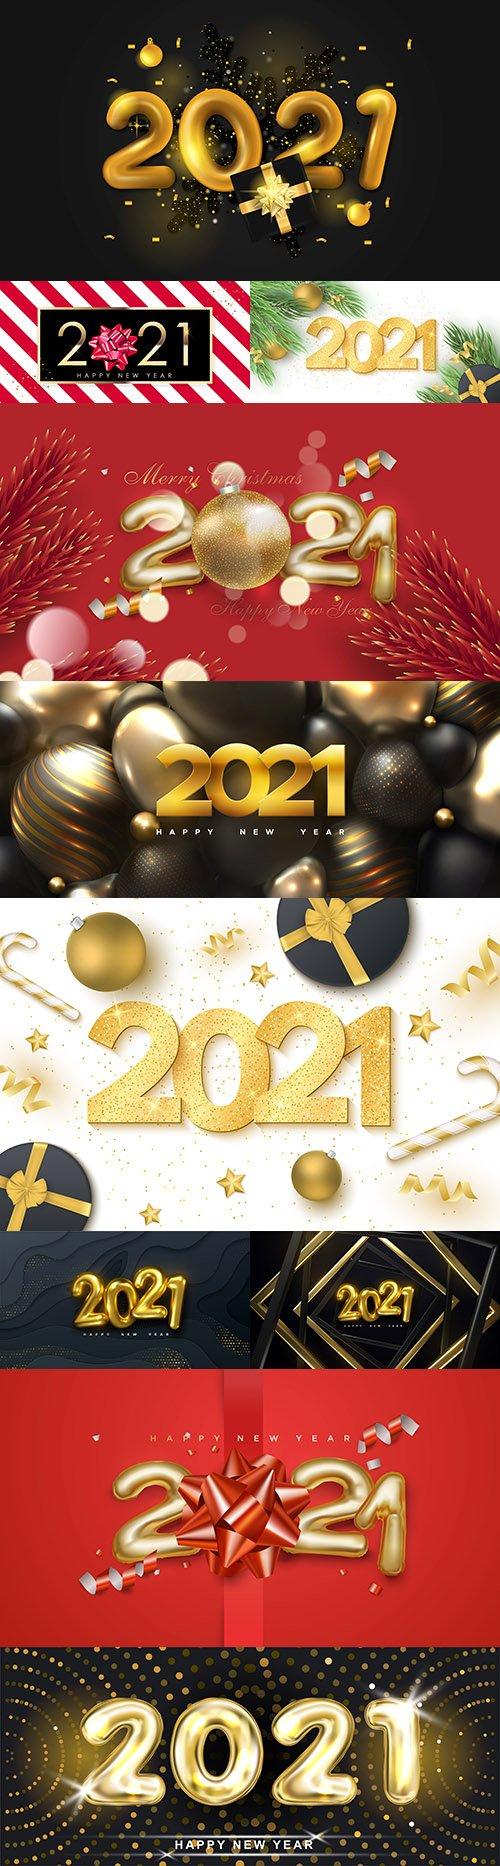 2021 New Year's illustrations Festive design inscription 3